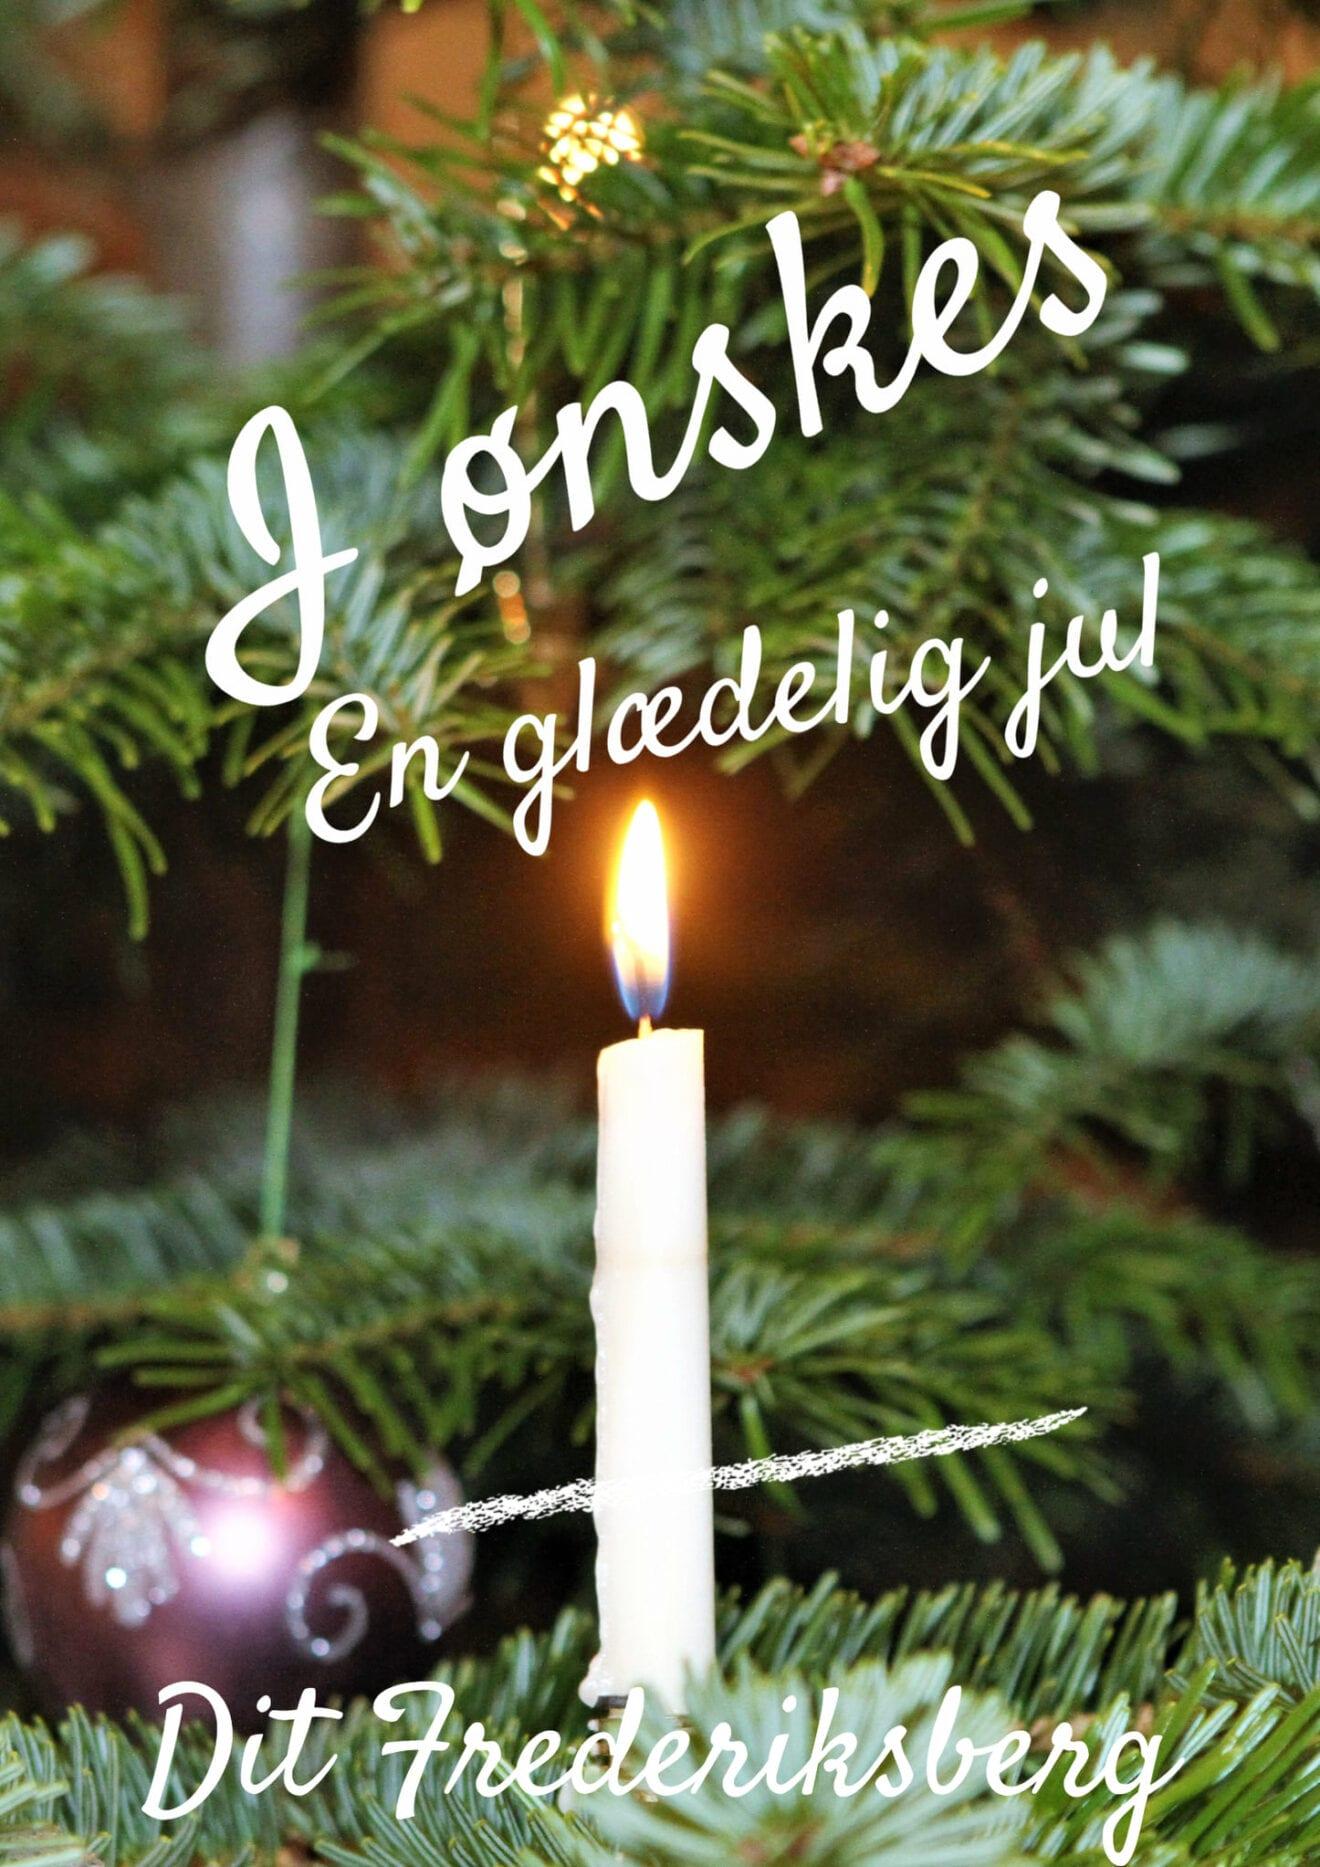 Redaktionen går på juleferie d. 18. december